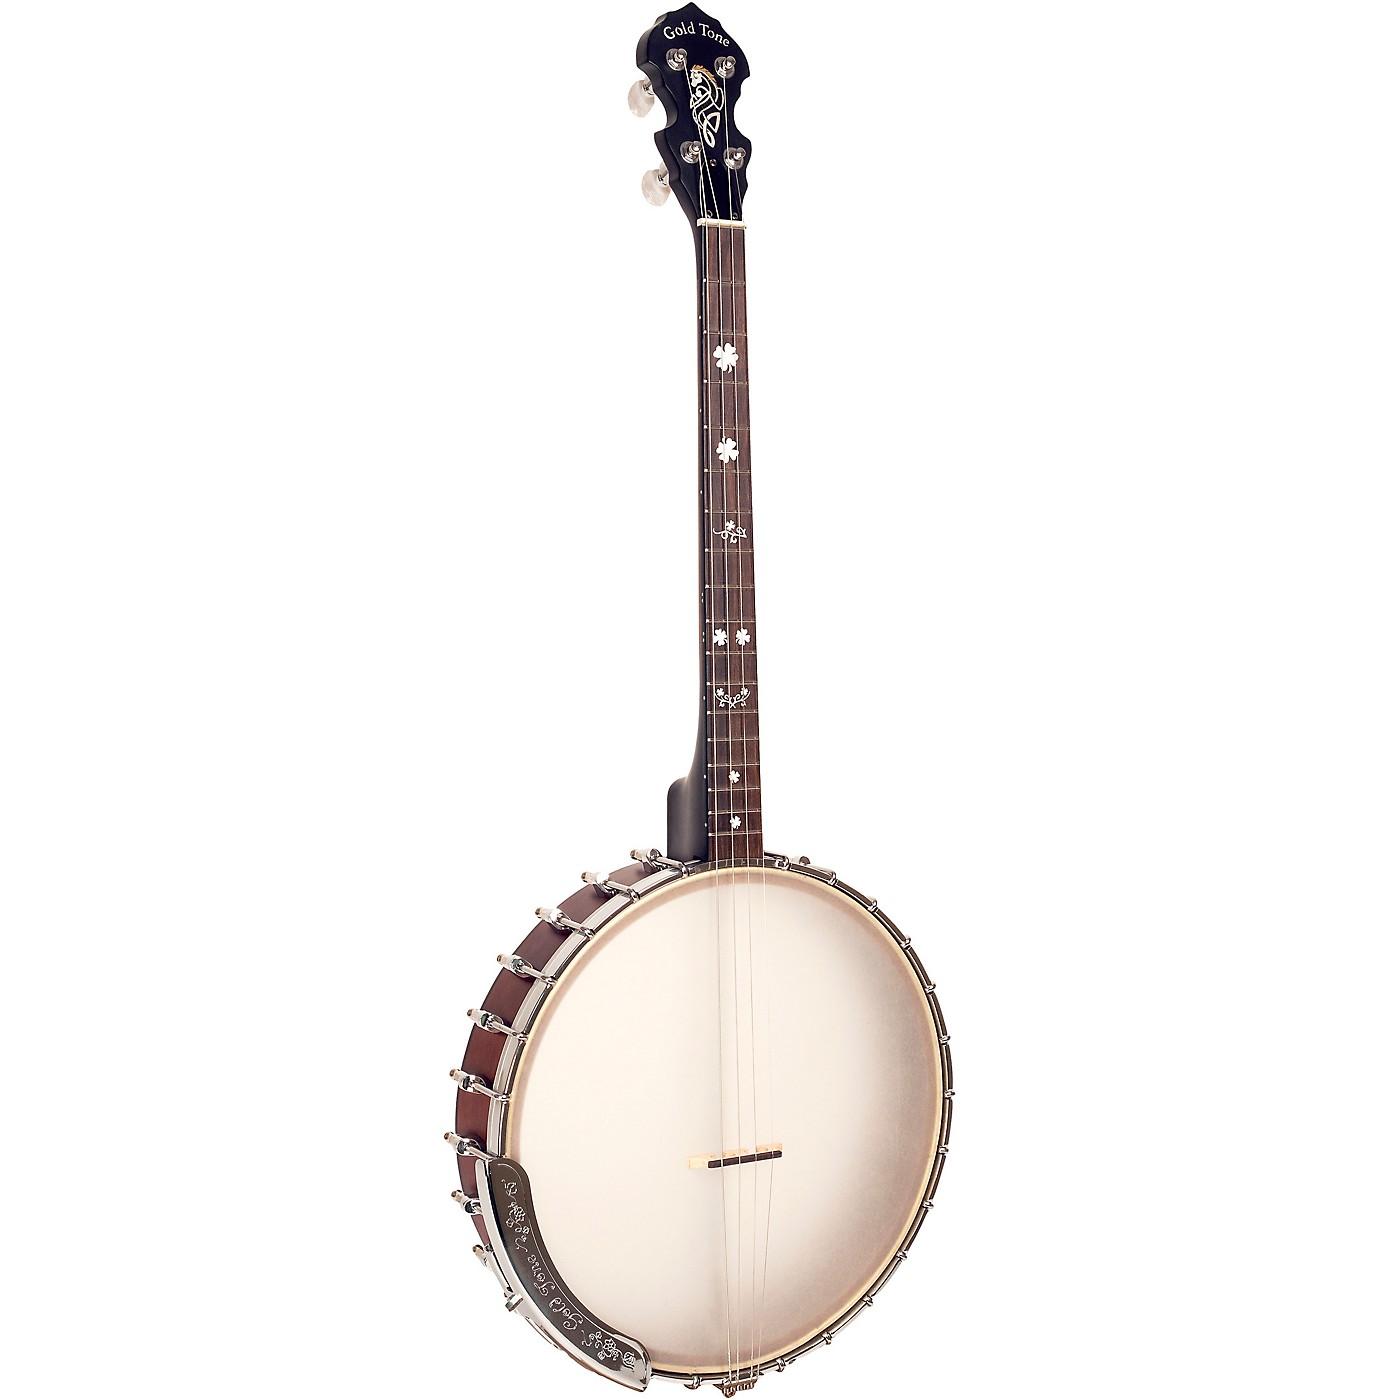 Gold Tone Irish Tenor Openback Banjo with 17 Frets For Left Hand Players thumbnail